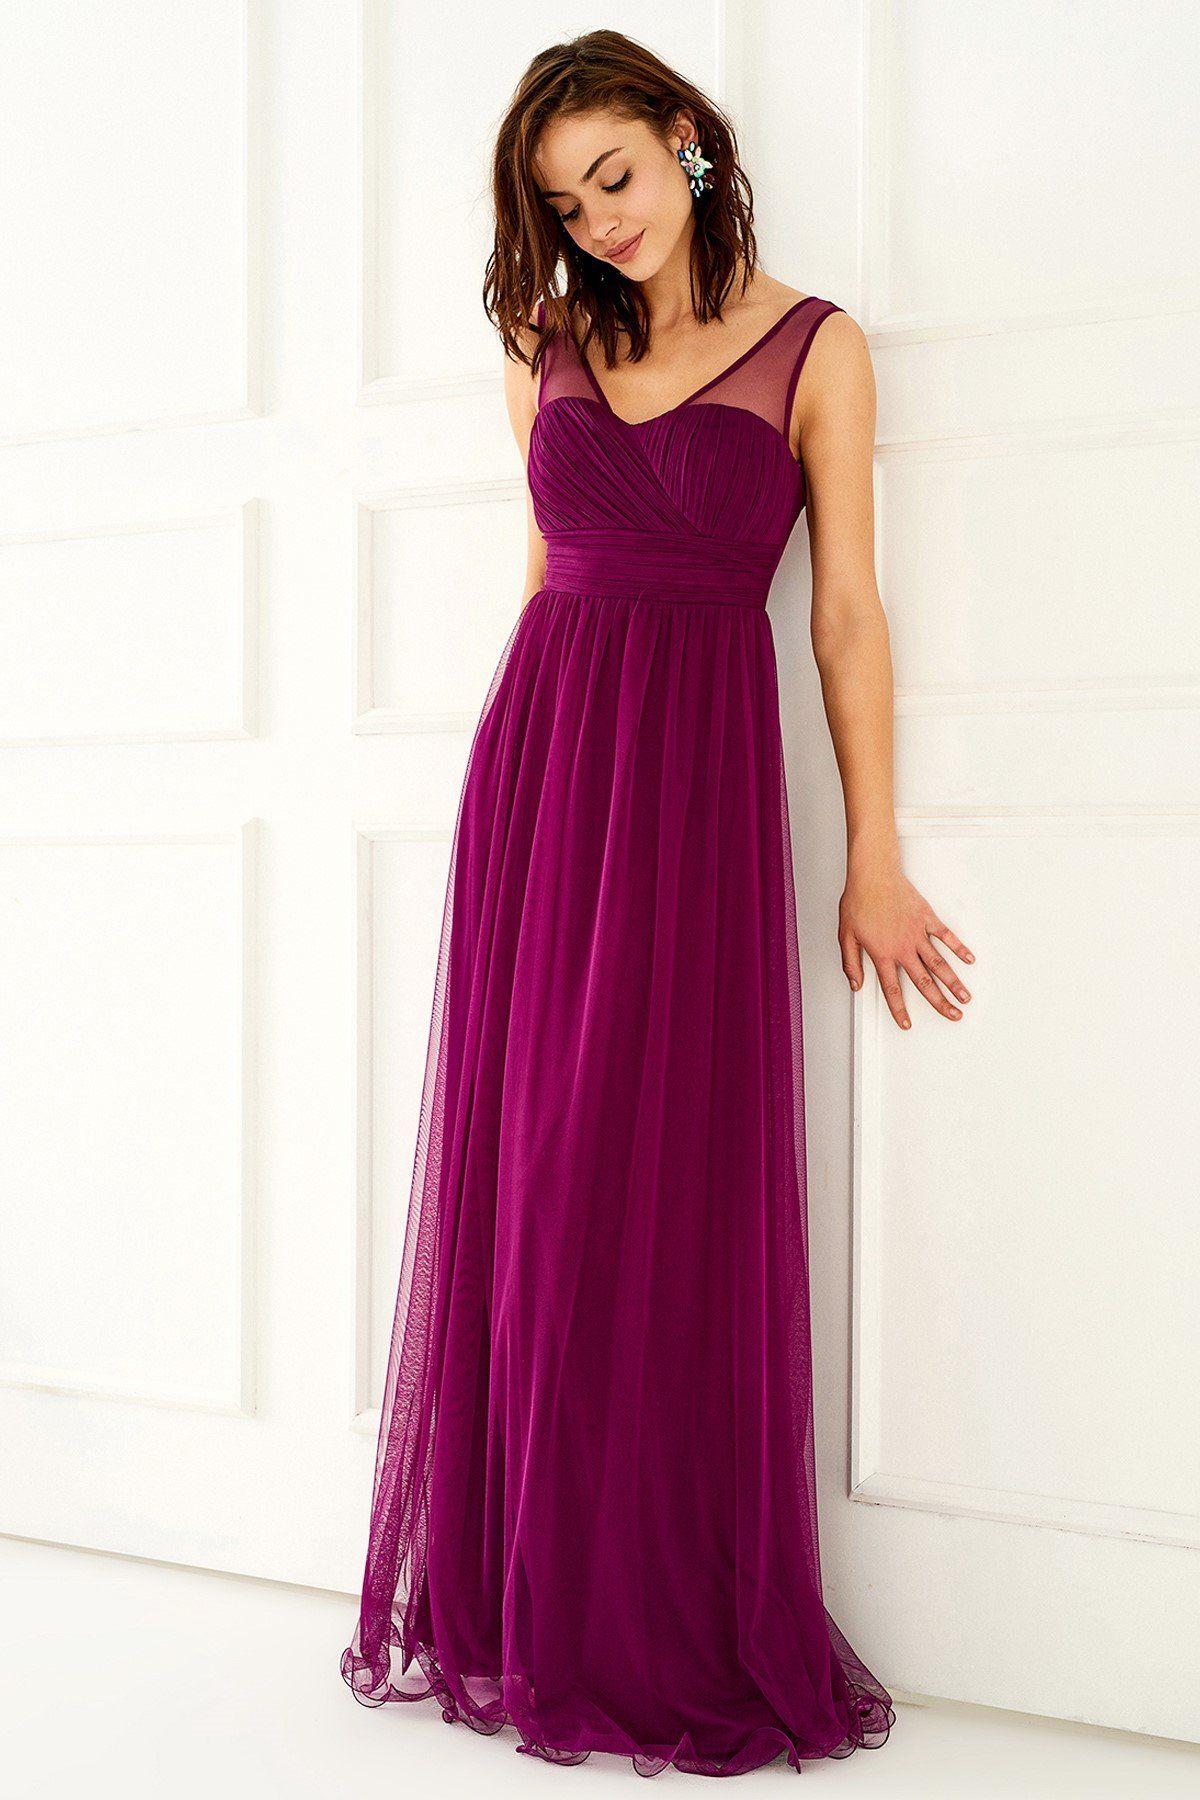 Tul Detayli Mor Elbise Mlwss16be0475 Trendyolmilla Trendyol The Dress Elbise Kadin